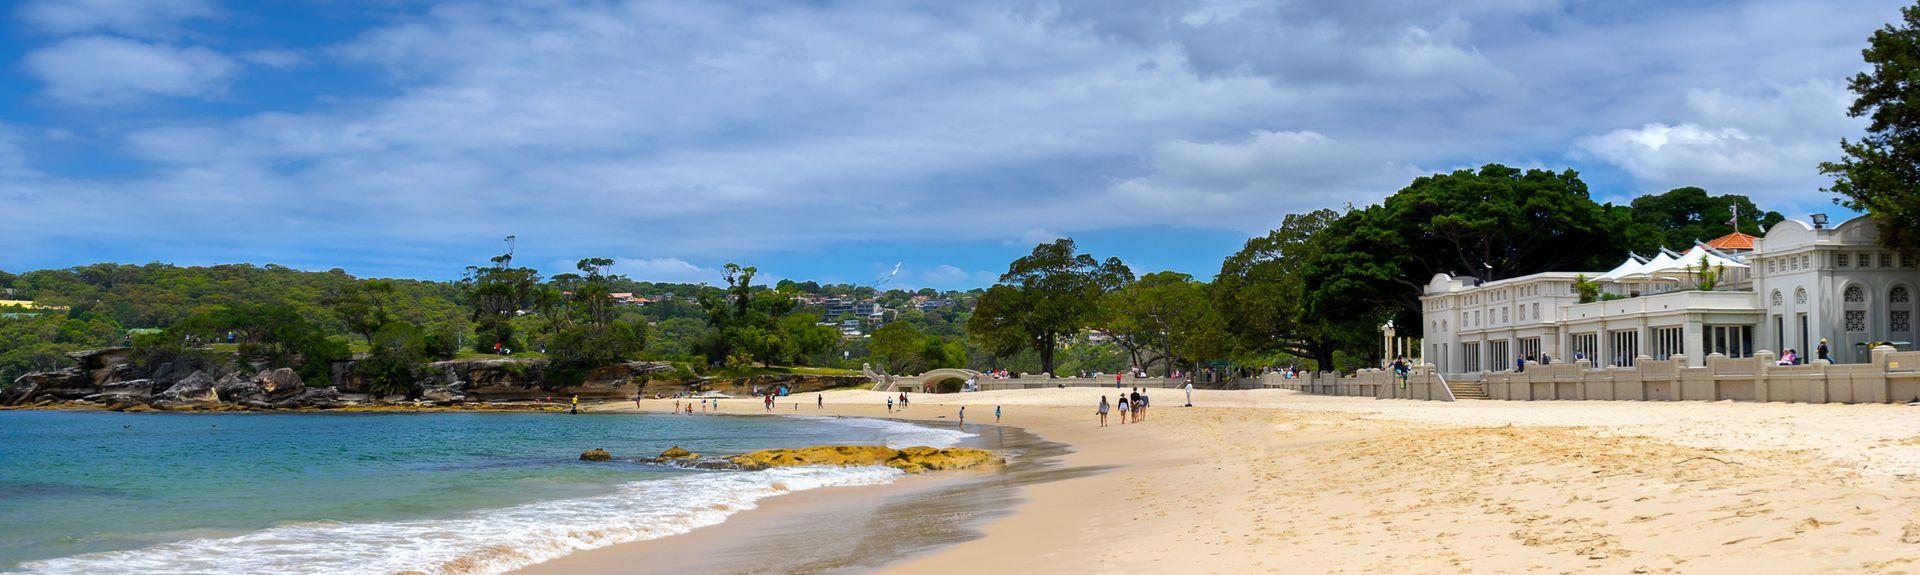 Balmoral Beach, Sydney NSW, Australia